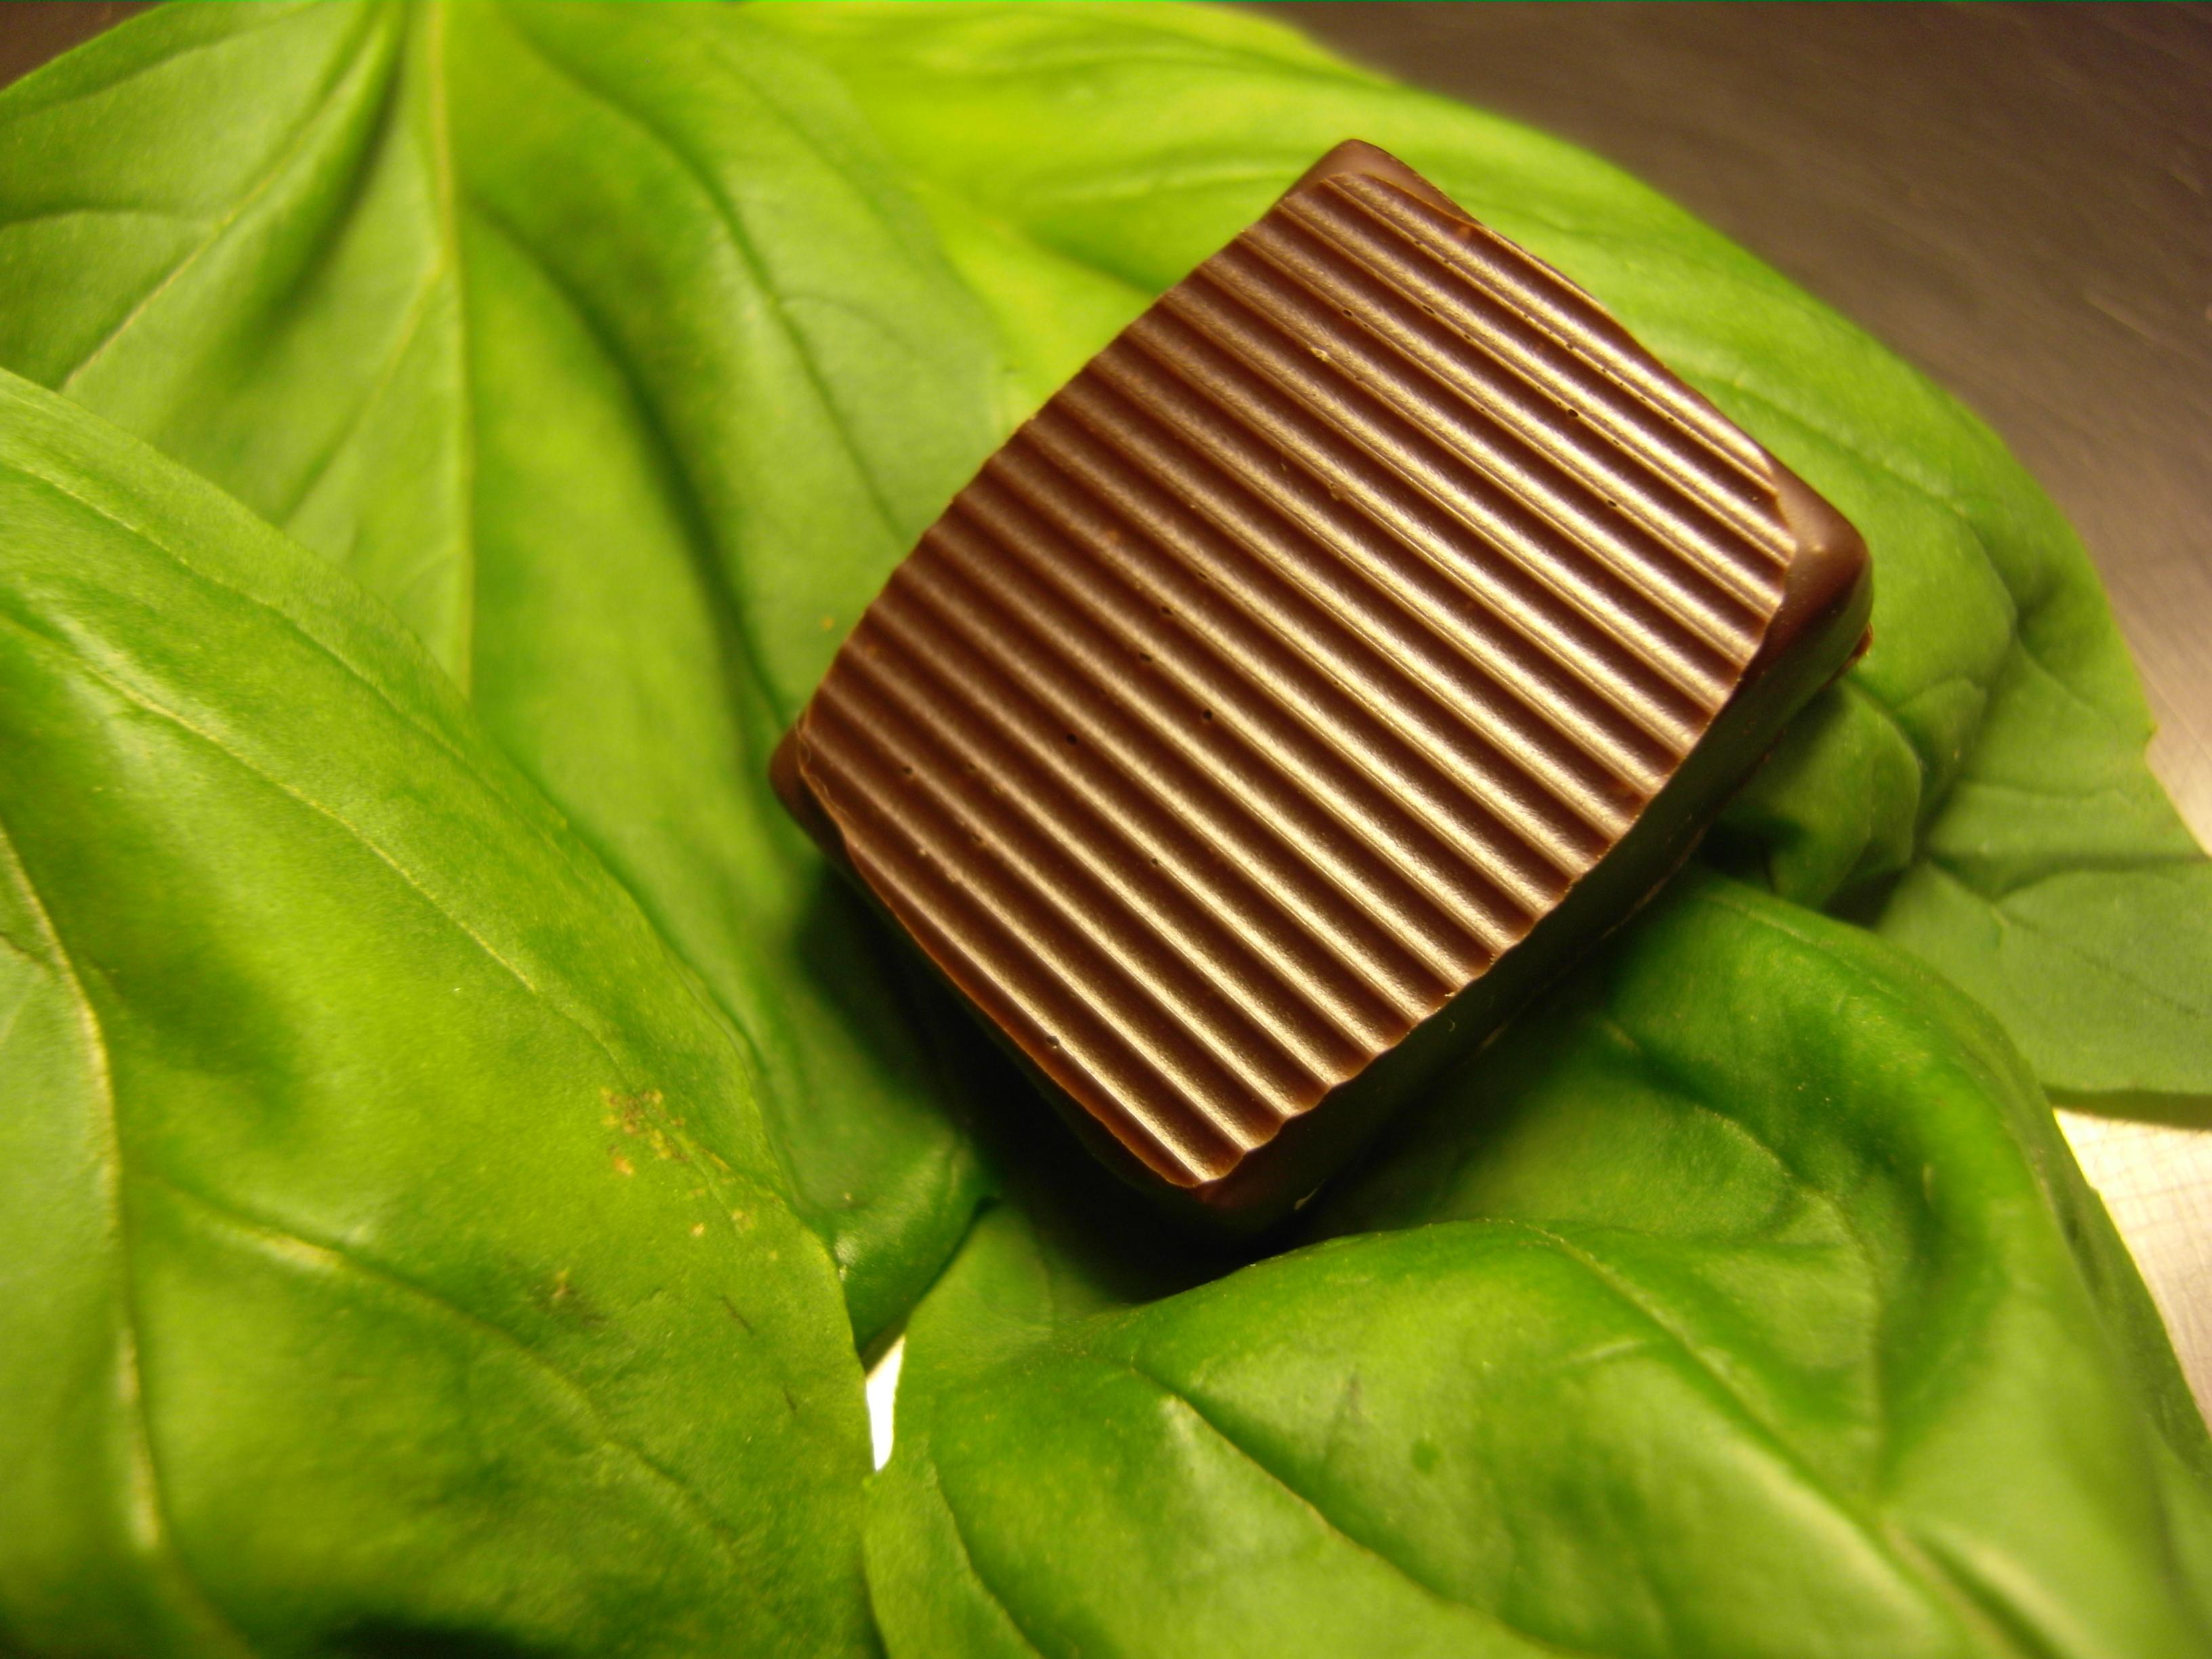 Chocolat avec ganache basilic%252C Gilles Cresno chocolatier%252C Rueil-Malmaison%252C 2010. Gilles Cresno chocolatier%252C 2010